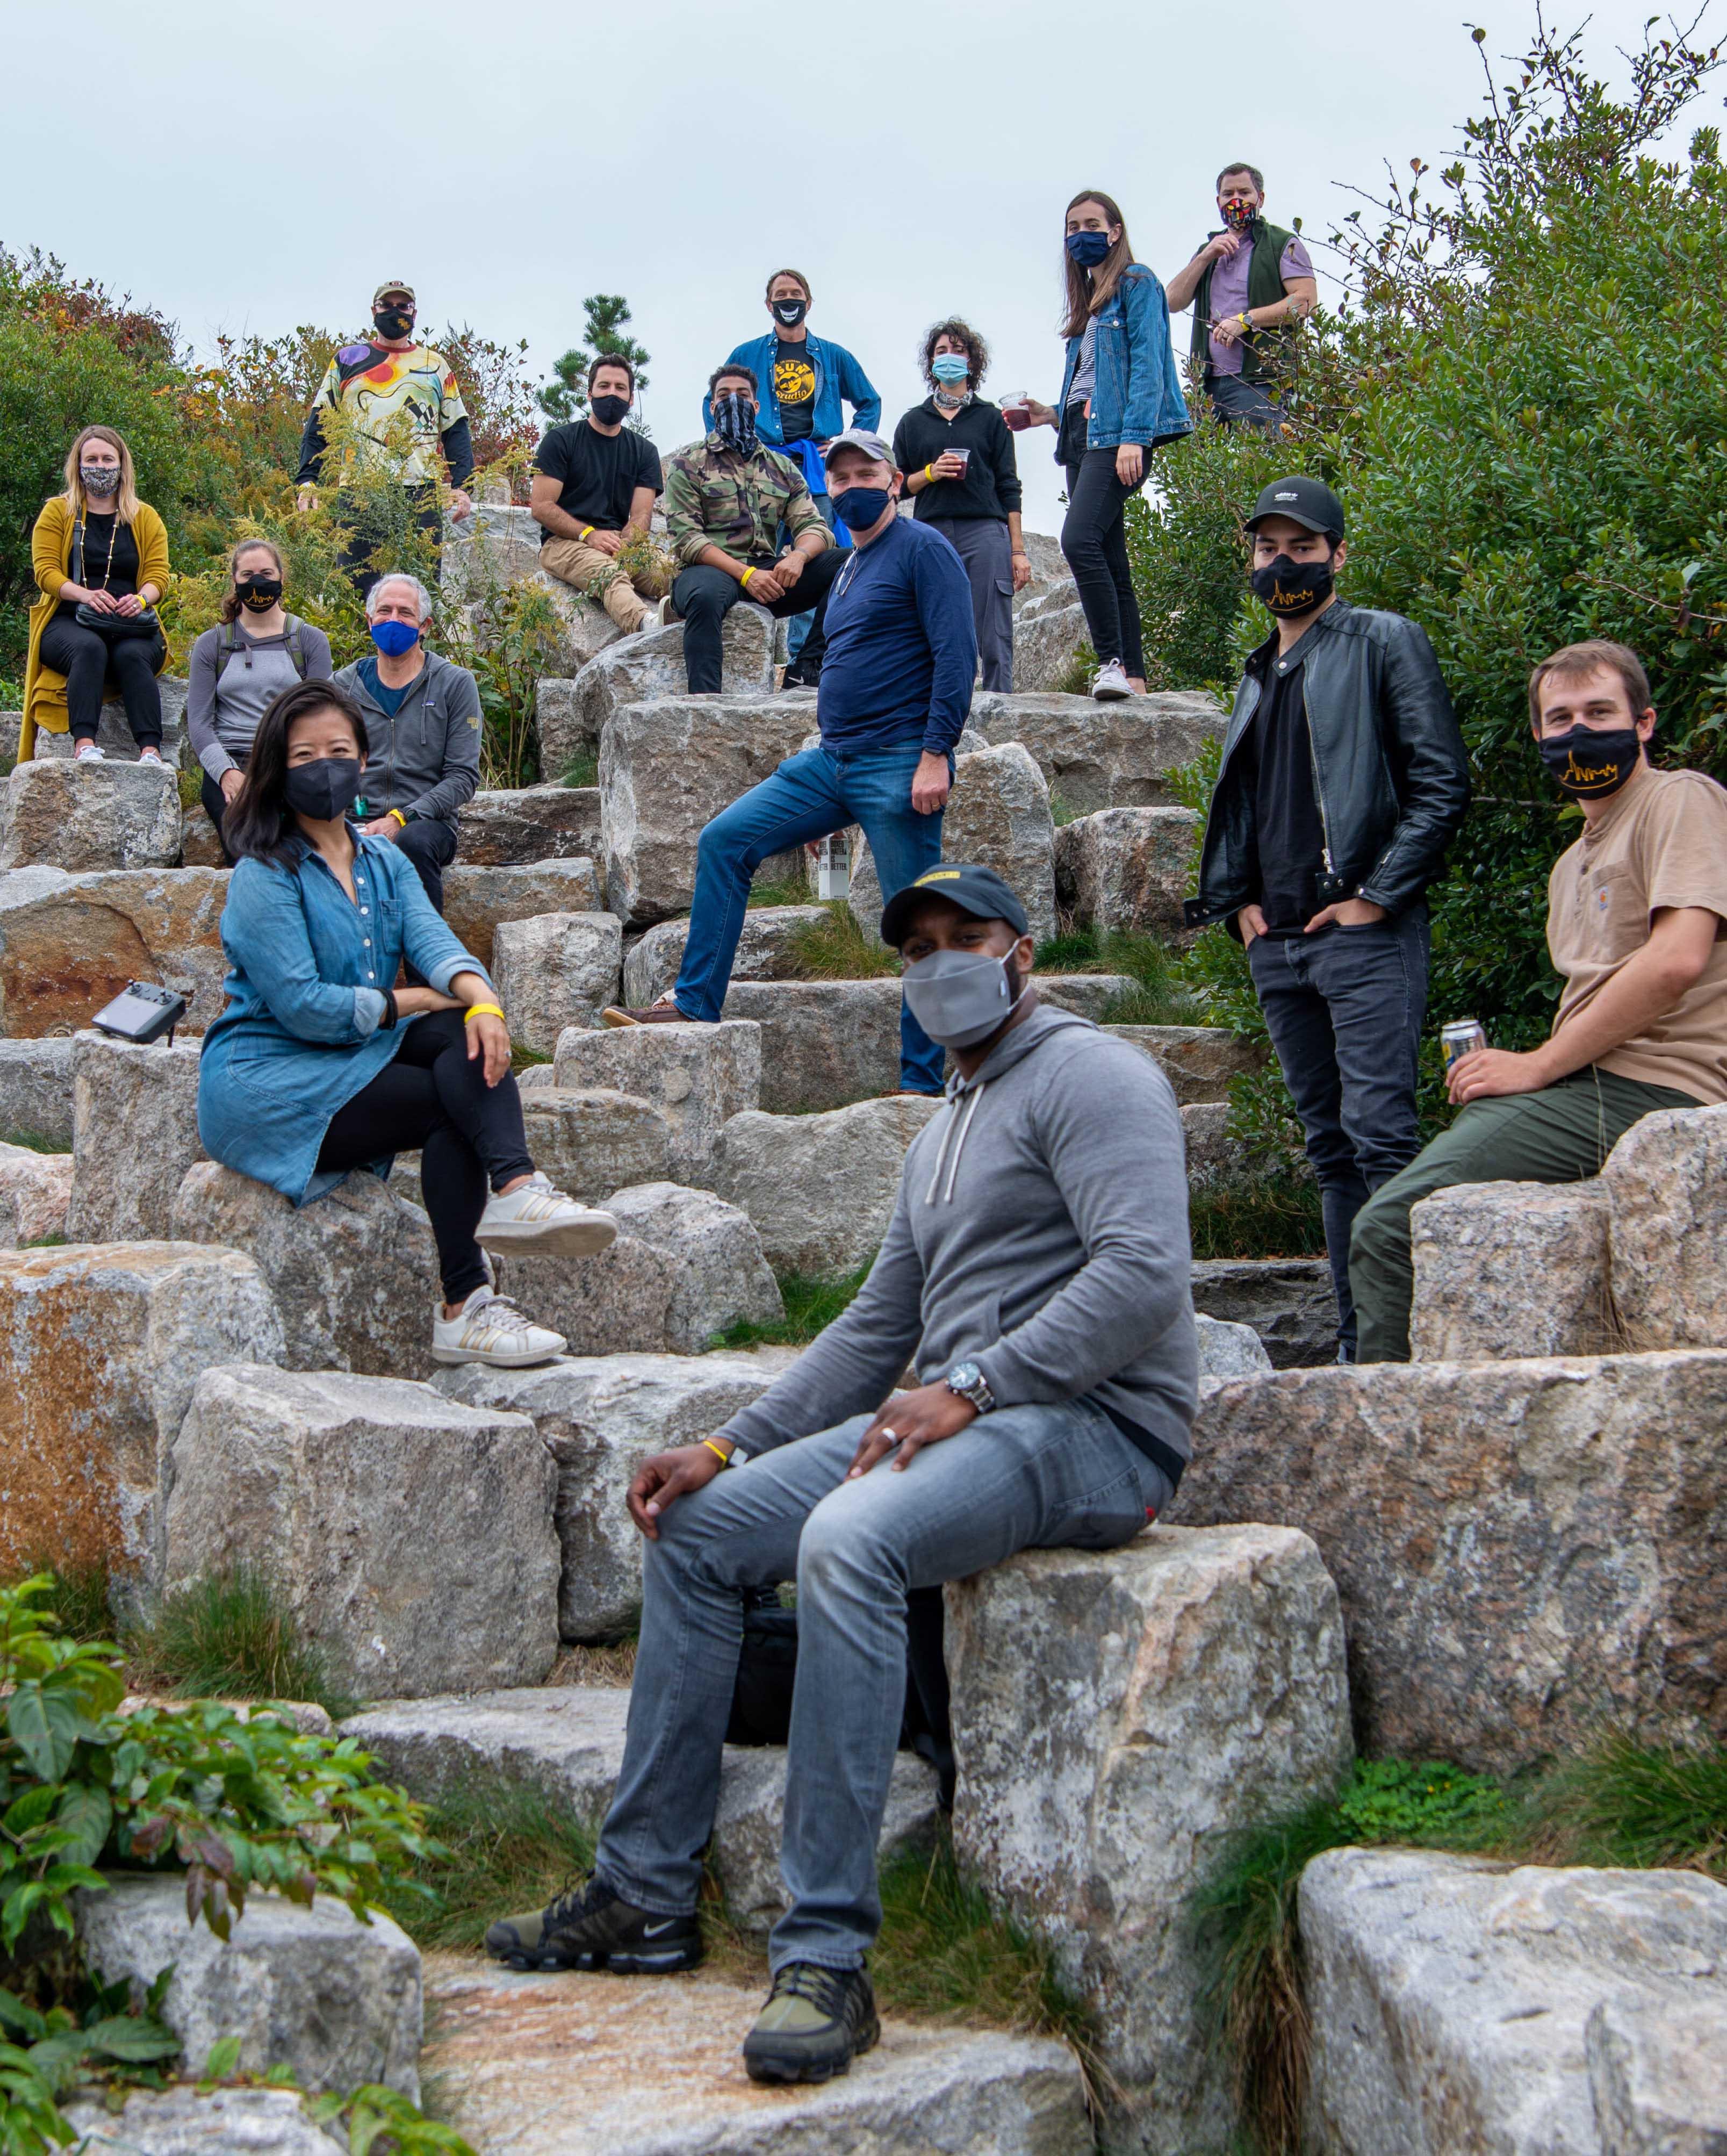 Sidewalk Labs team members sit on rocks with masks.